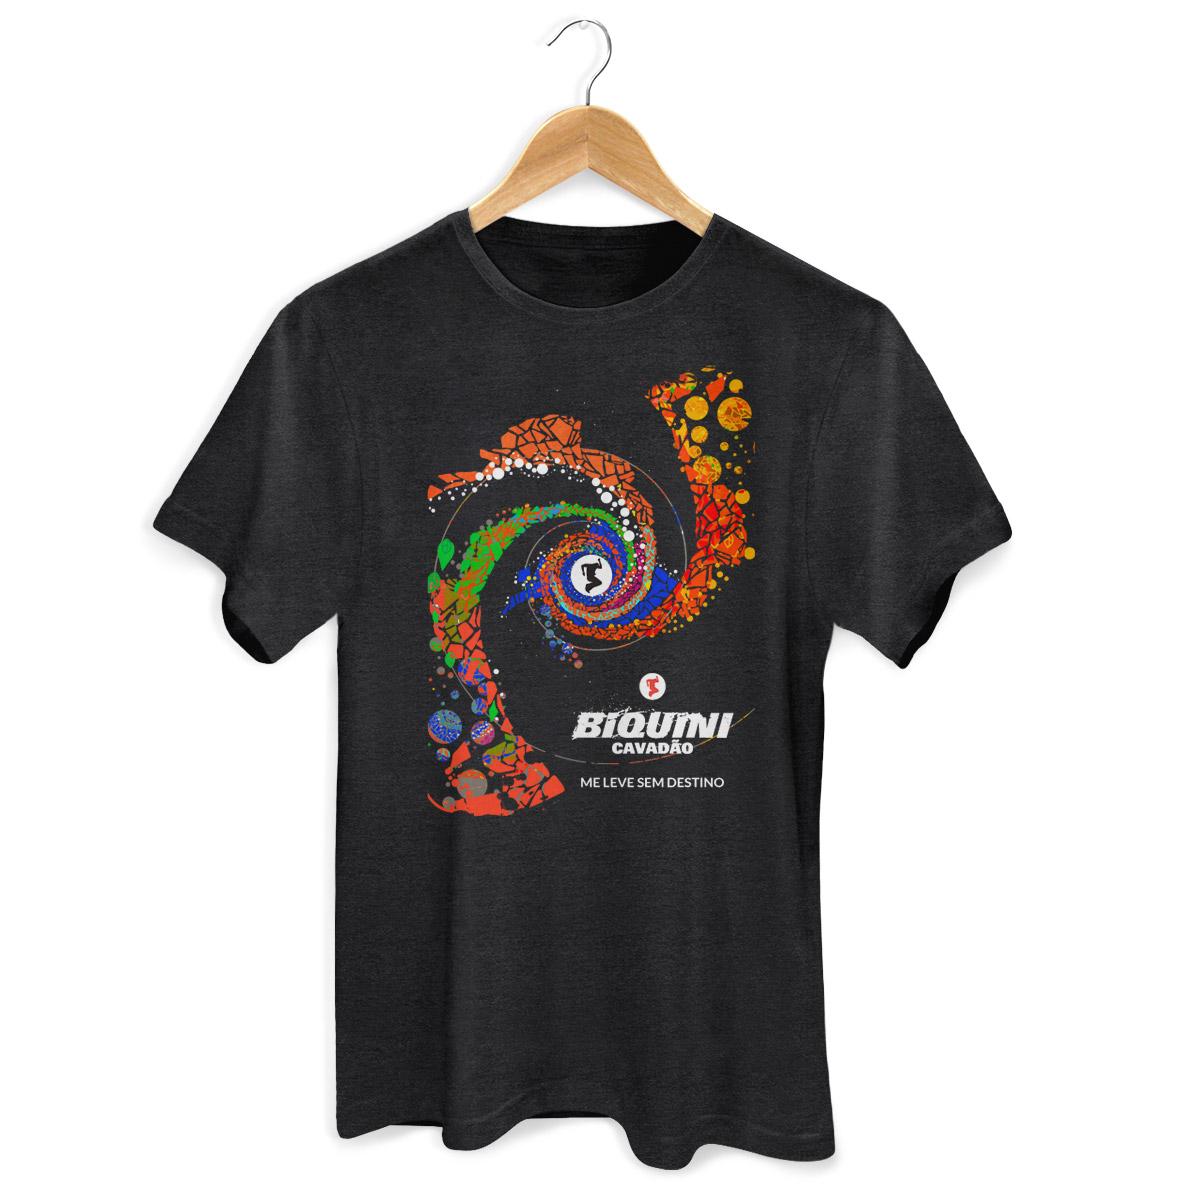 Camiseta Masculina Biquini Cavadão Me Leve Sem Destino